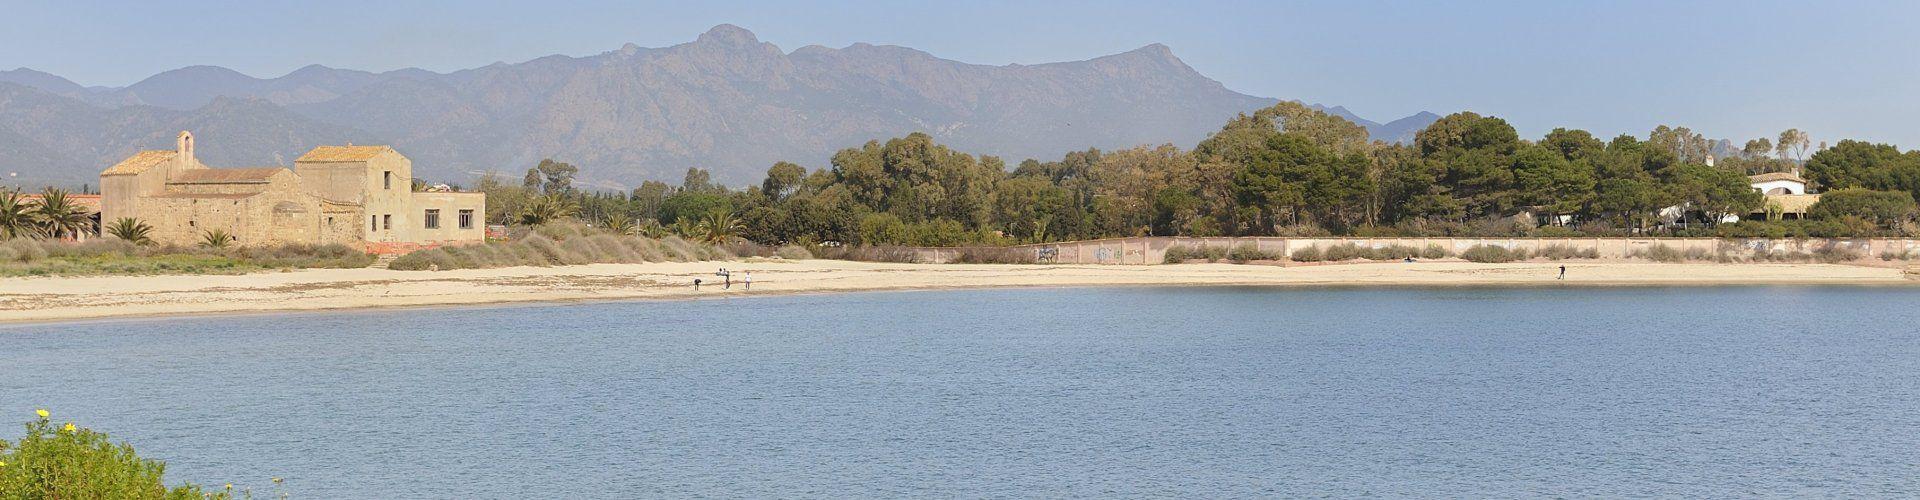 Blick auf Su Faru mit Strand